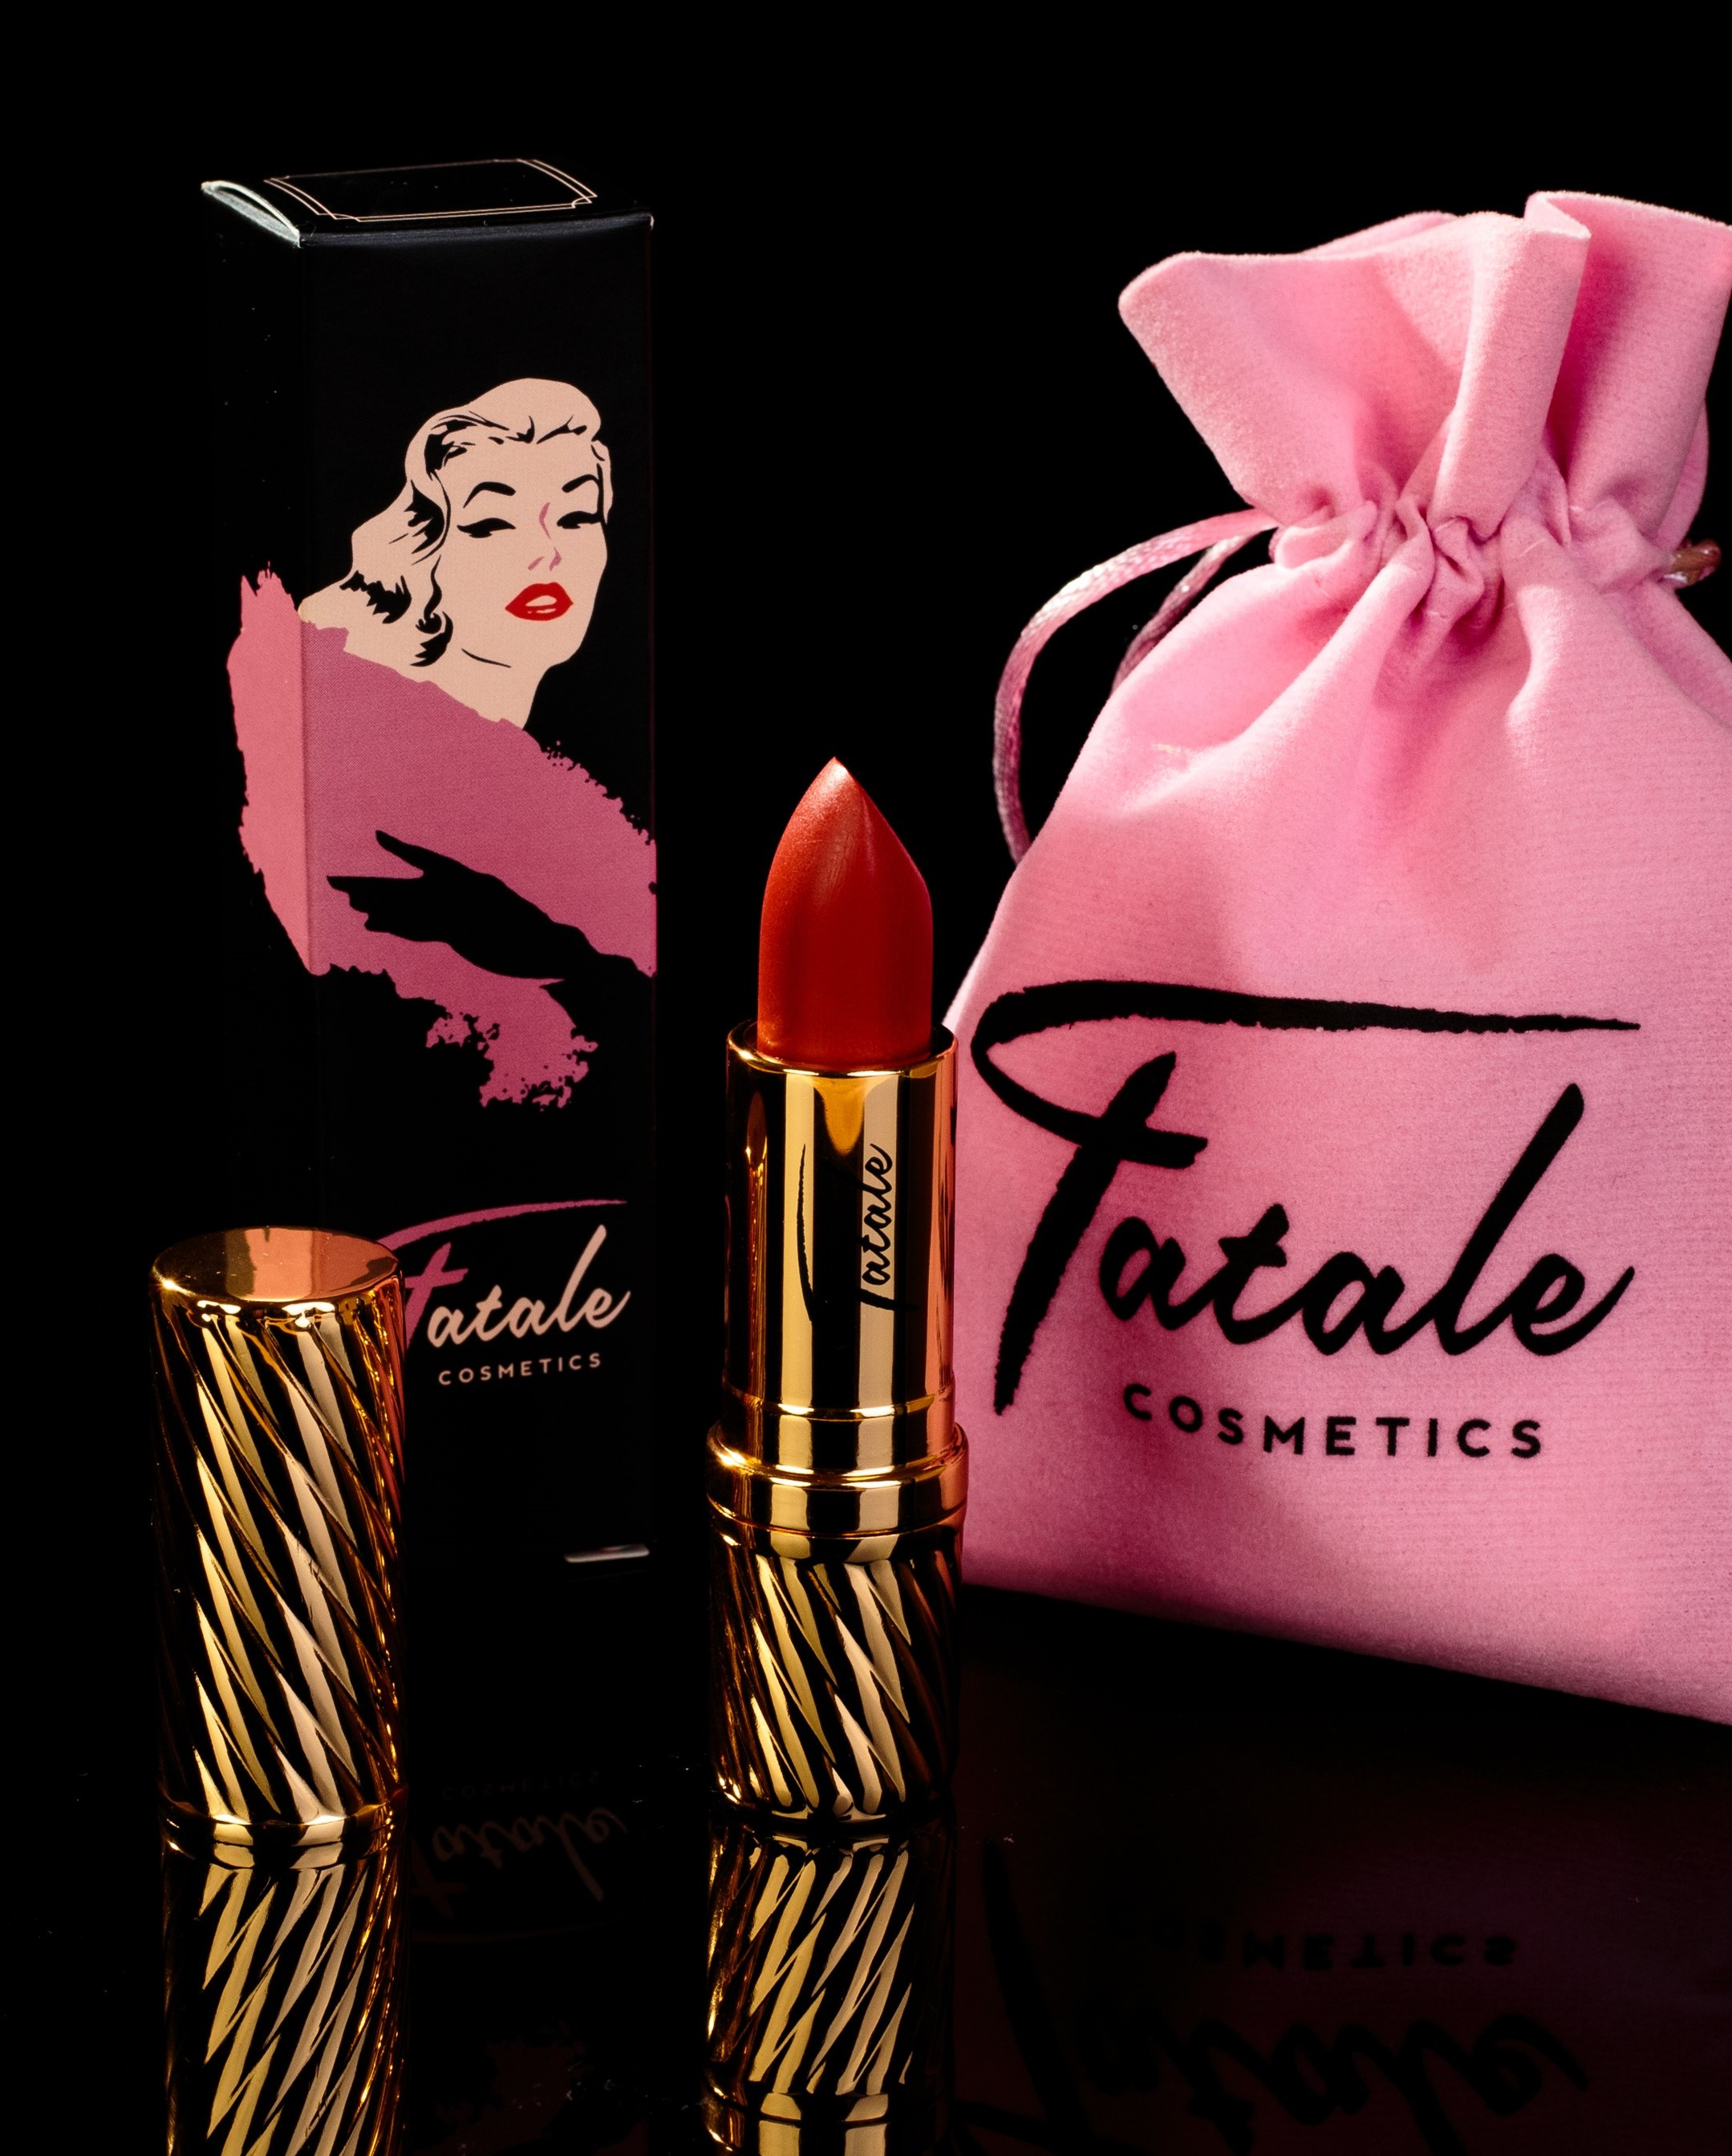 Fatale Cosmetics